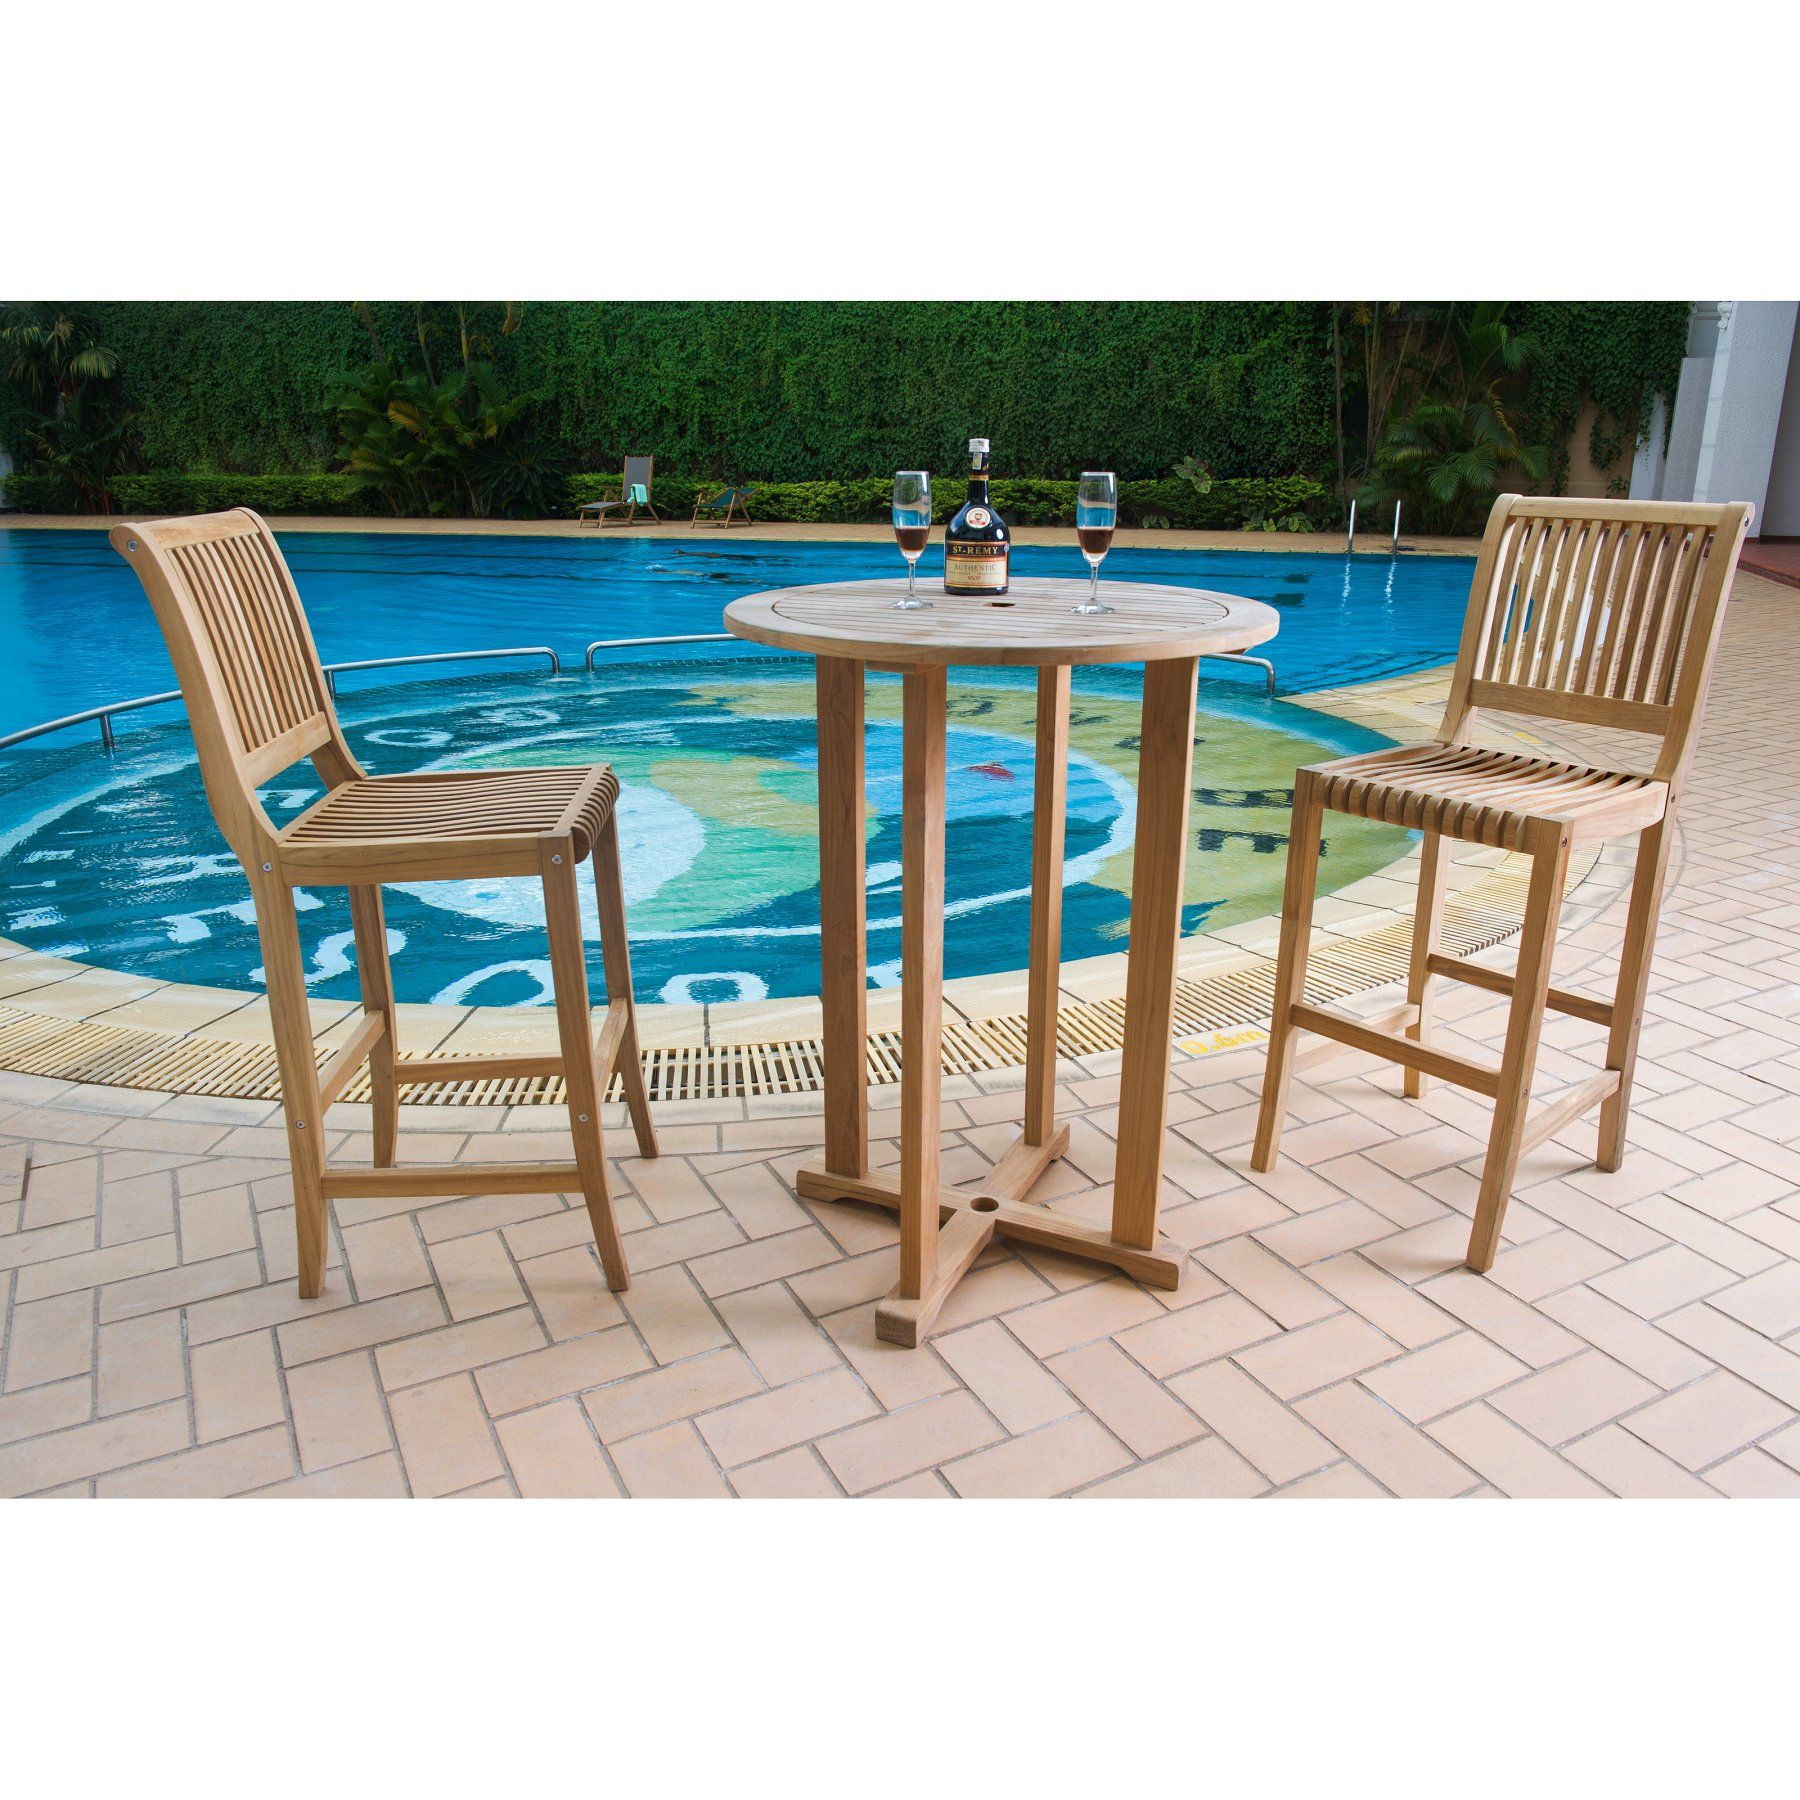 HiTeak Furniture Palm Piece BarHeight Outdoor Bistro Set HLSPB - Teak bar height outdoor table